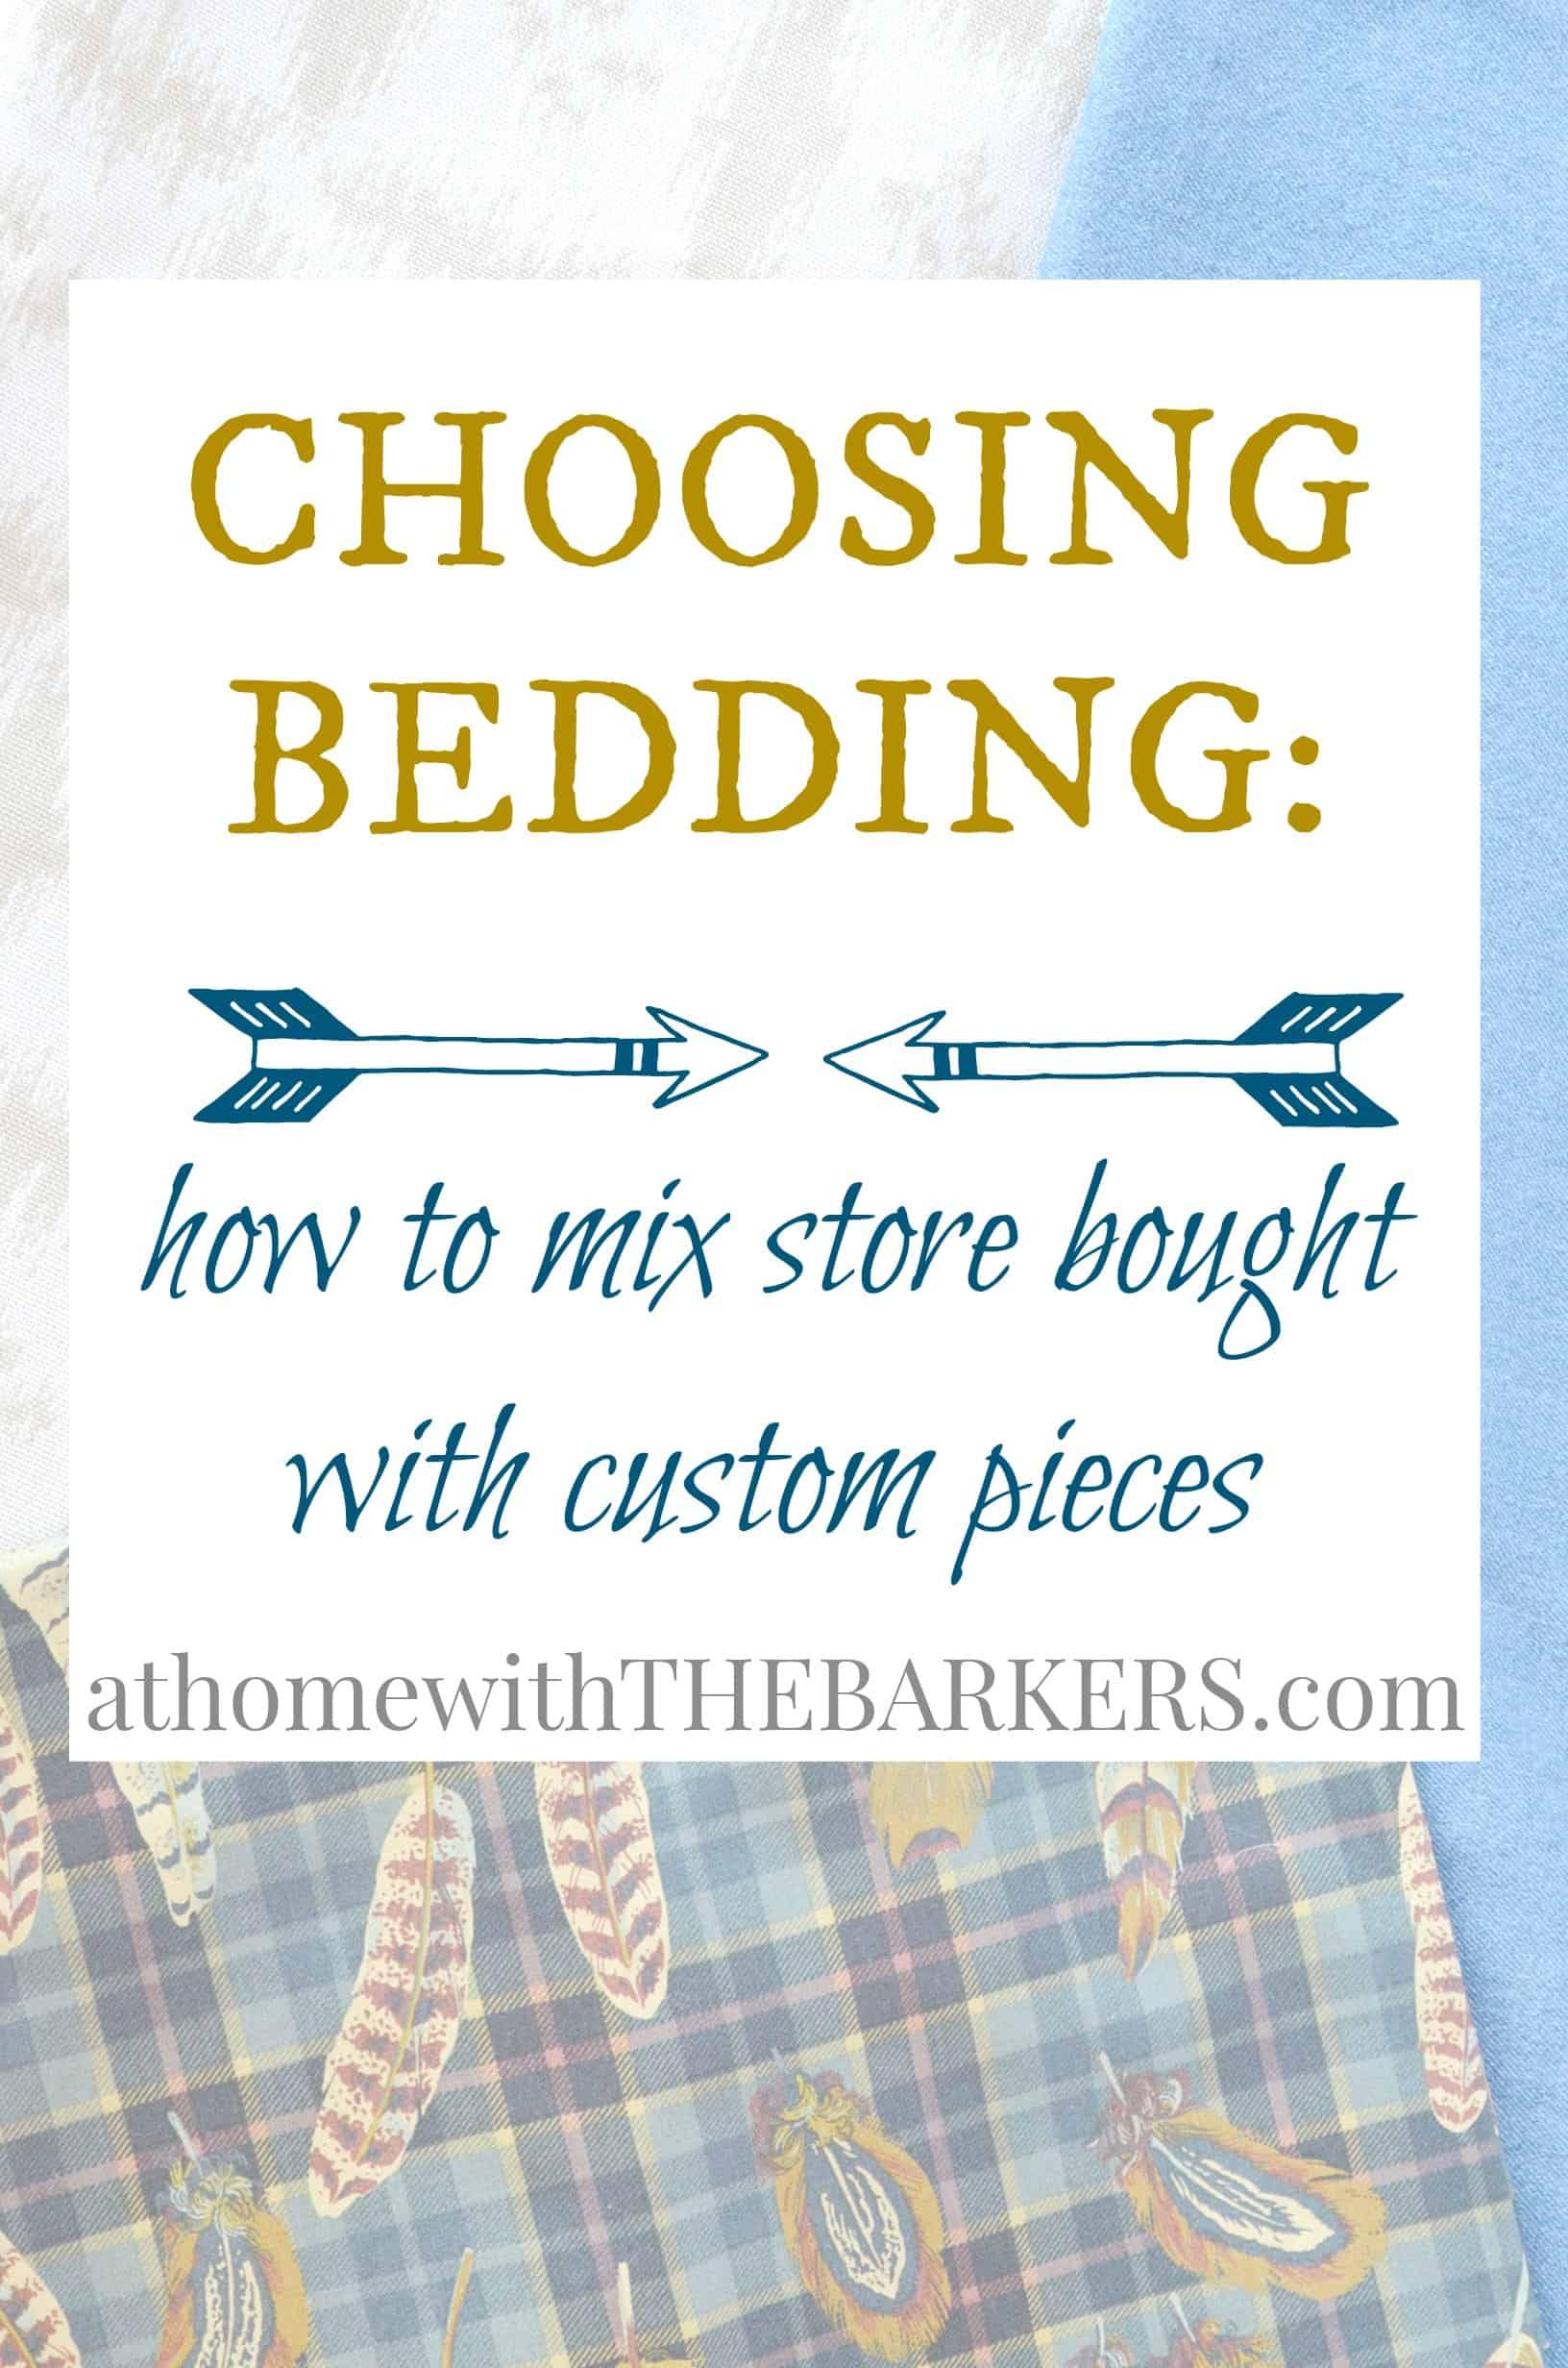 Choosing Bedding